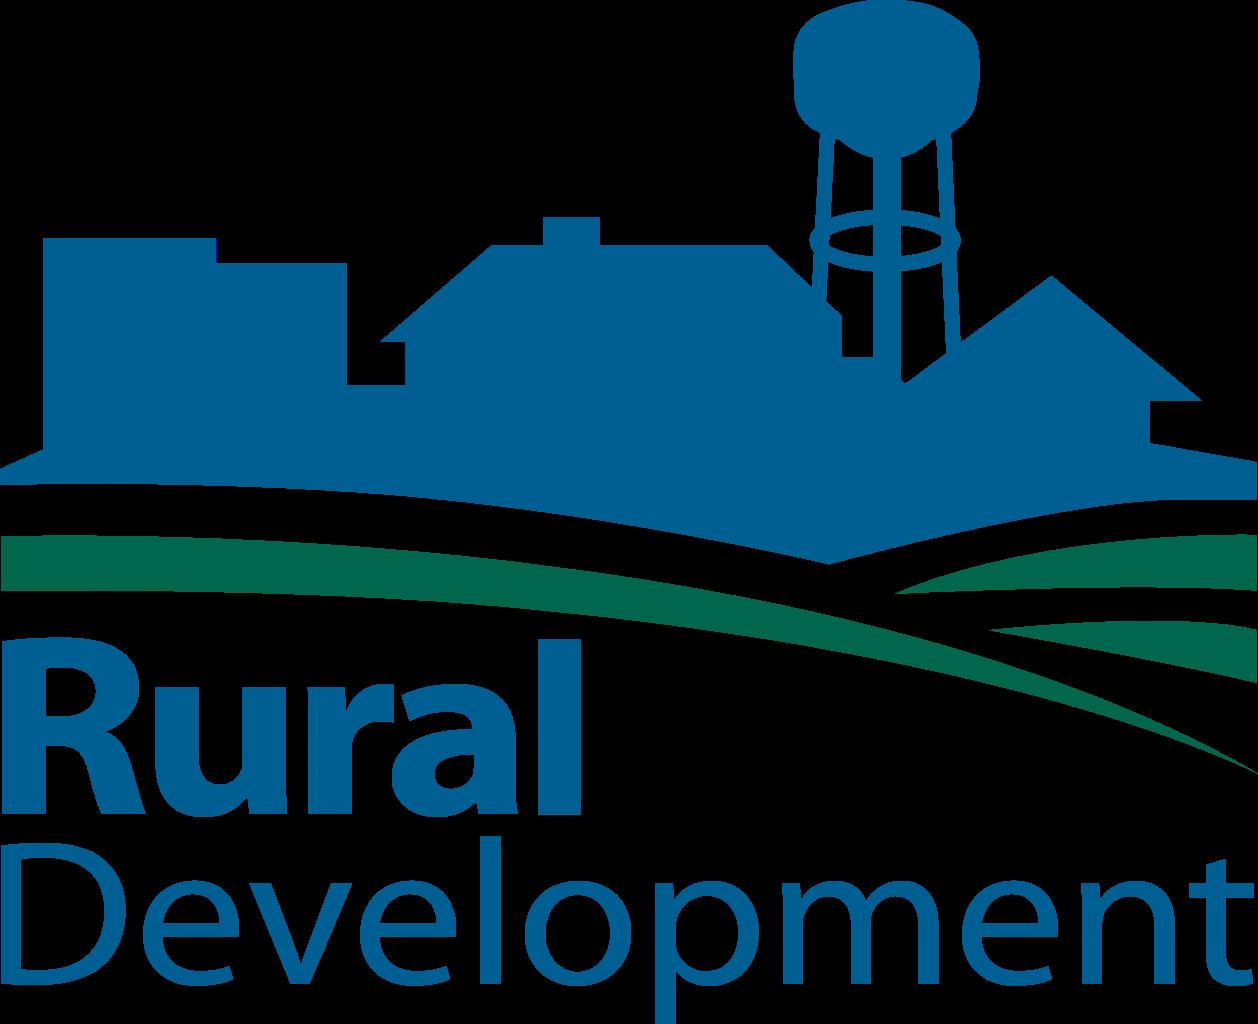 File usda ruraldevelopment logo. Agriculture clipart rural development